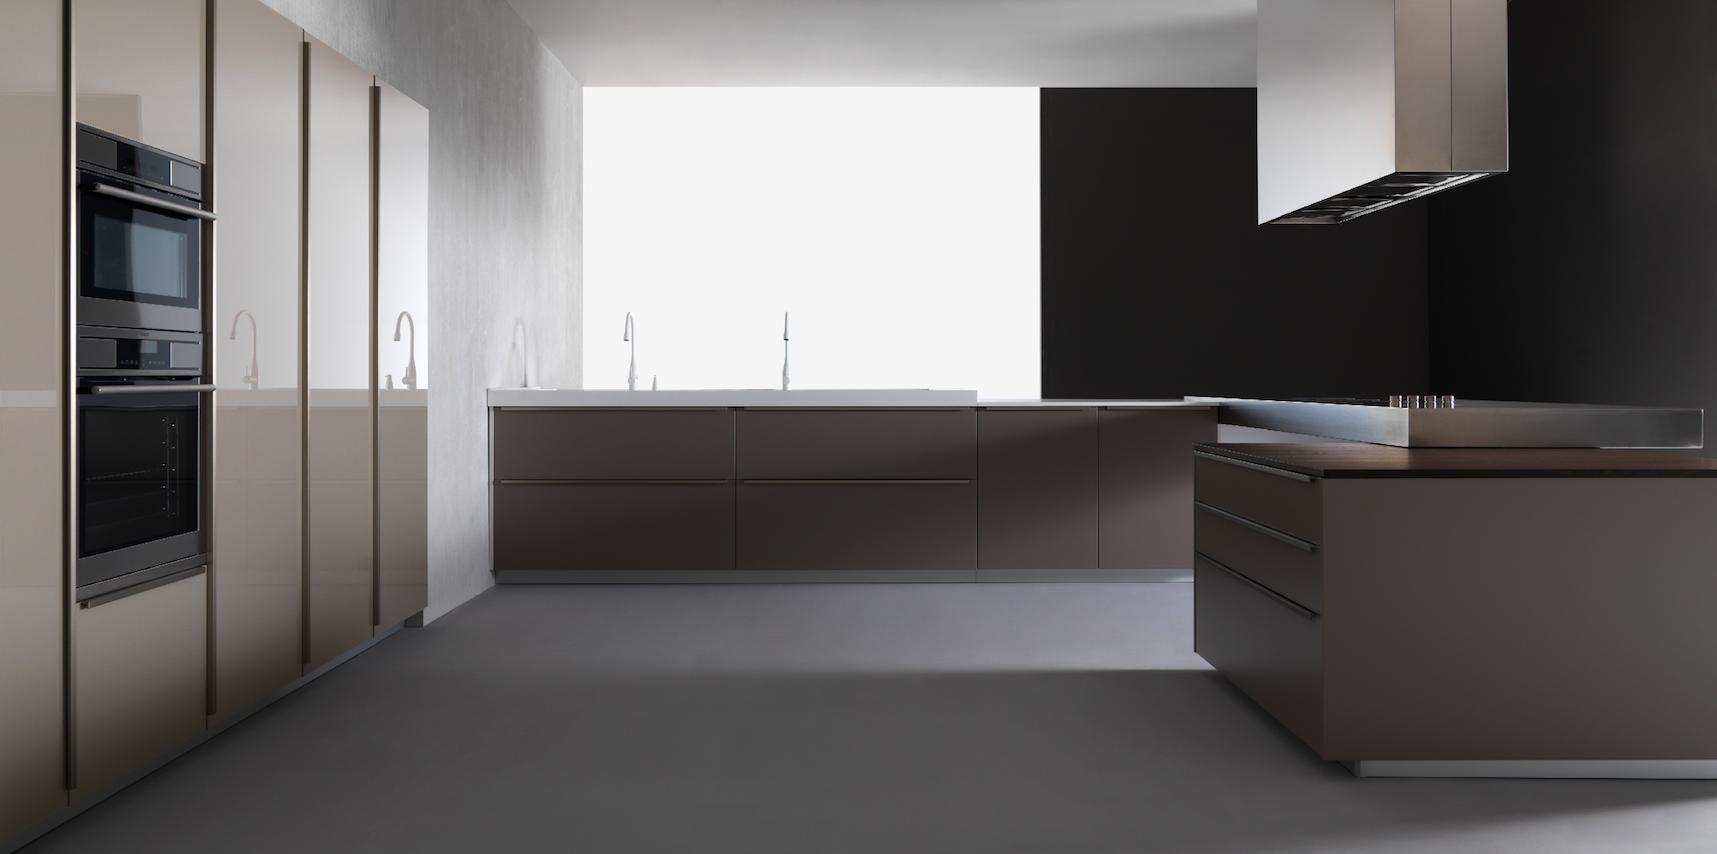 Effeti - Luce Kitchen. For more information contact us on rooms@moretti-rosini.com